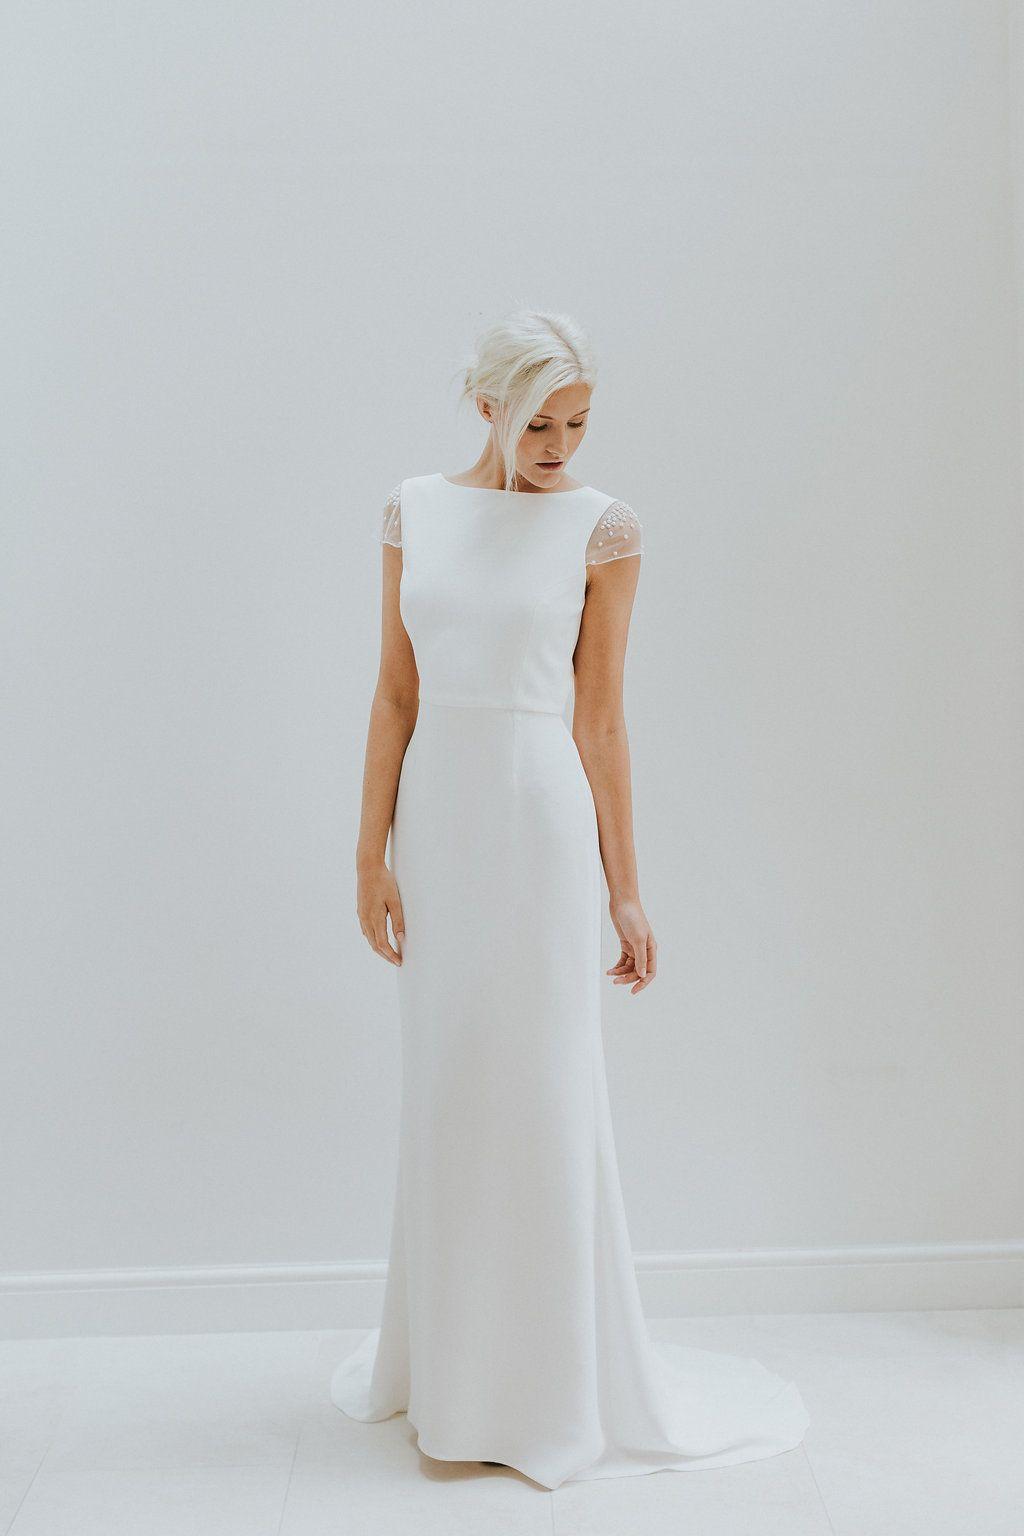 Simple modern wedding dress by Charlotte Simpson  Śluby  Pinterest